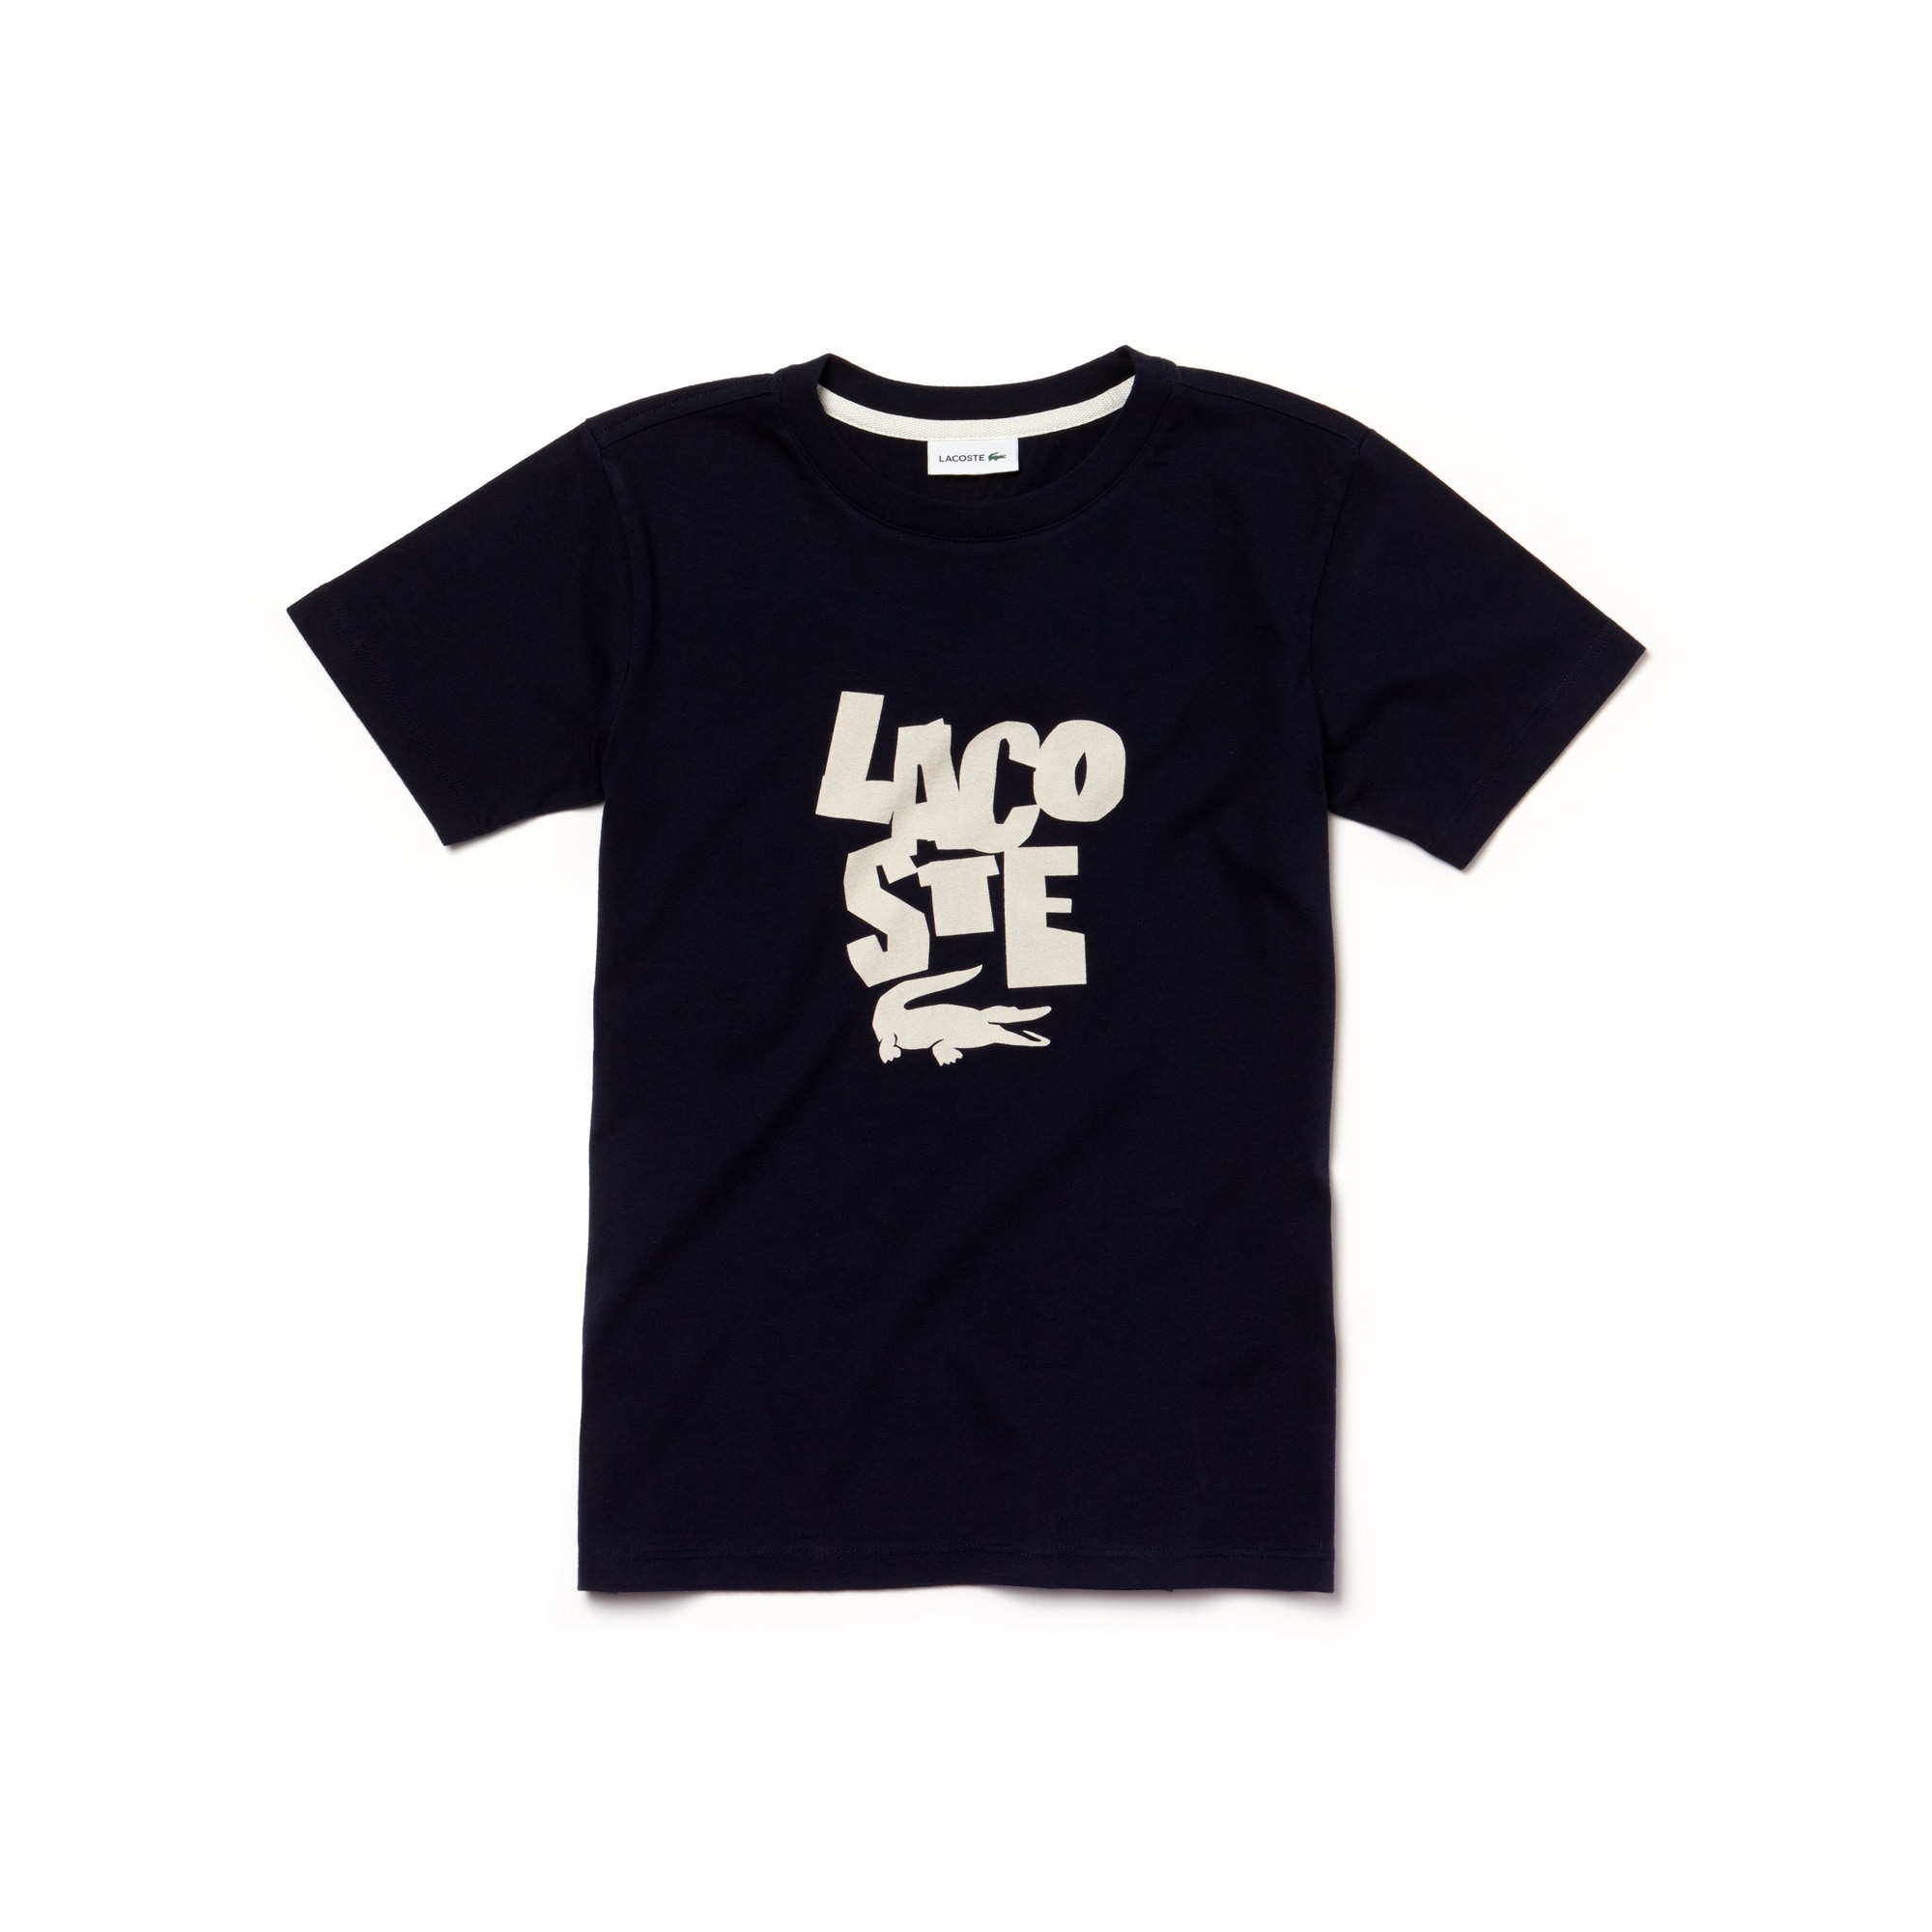 Camisetas, Camisas, Casacos e Suéteres para Meninos   Moda Kids   LACOSTE f7ba9a3dbc